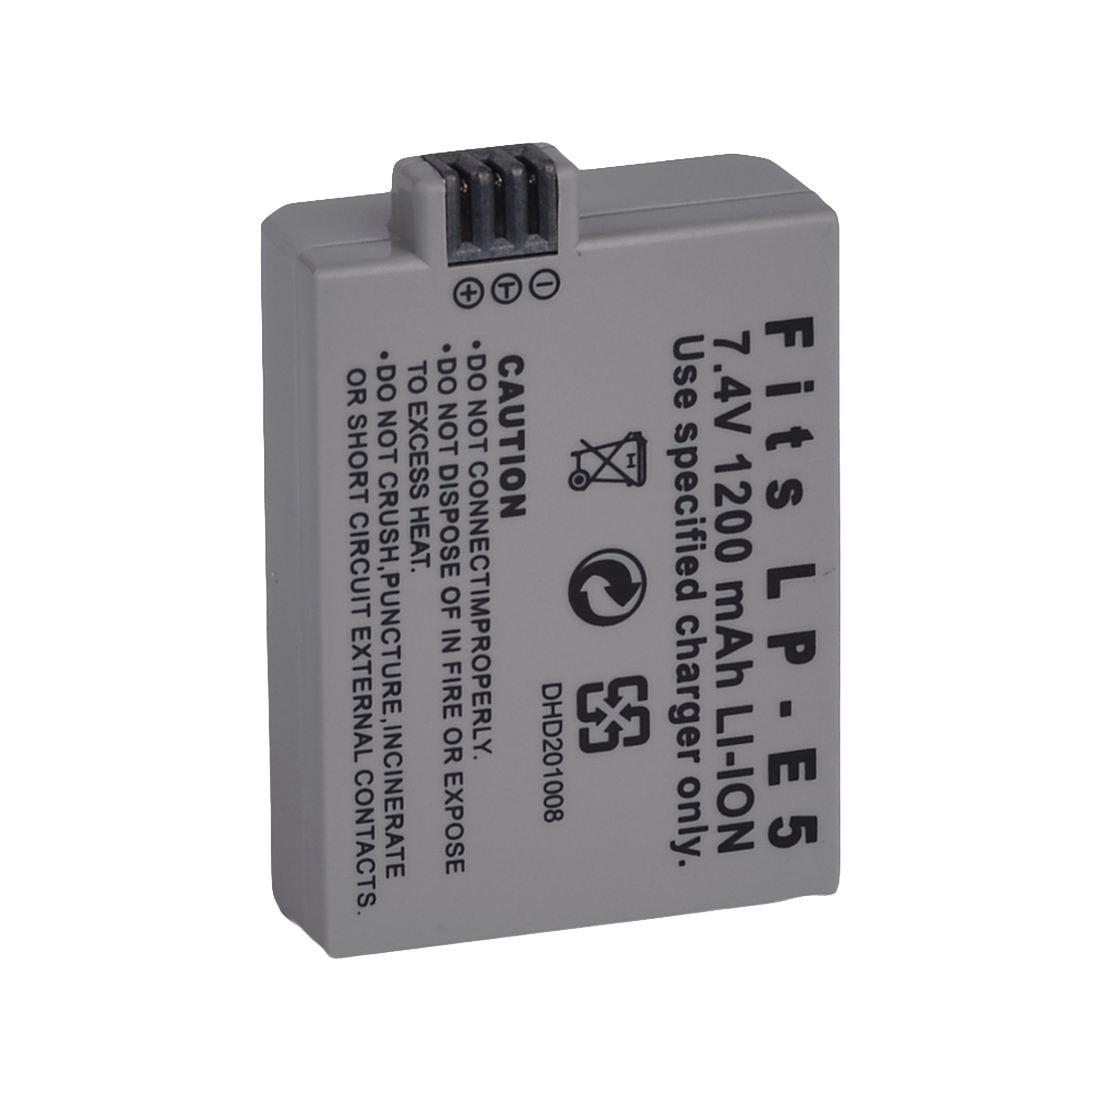 Accessories & Parts Consumer Electronics 2x1200mah Lp-e5 Battery+usb Charger For Canon 450d 500d 1000d Xs Rebel X Bg-e5